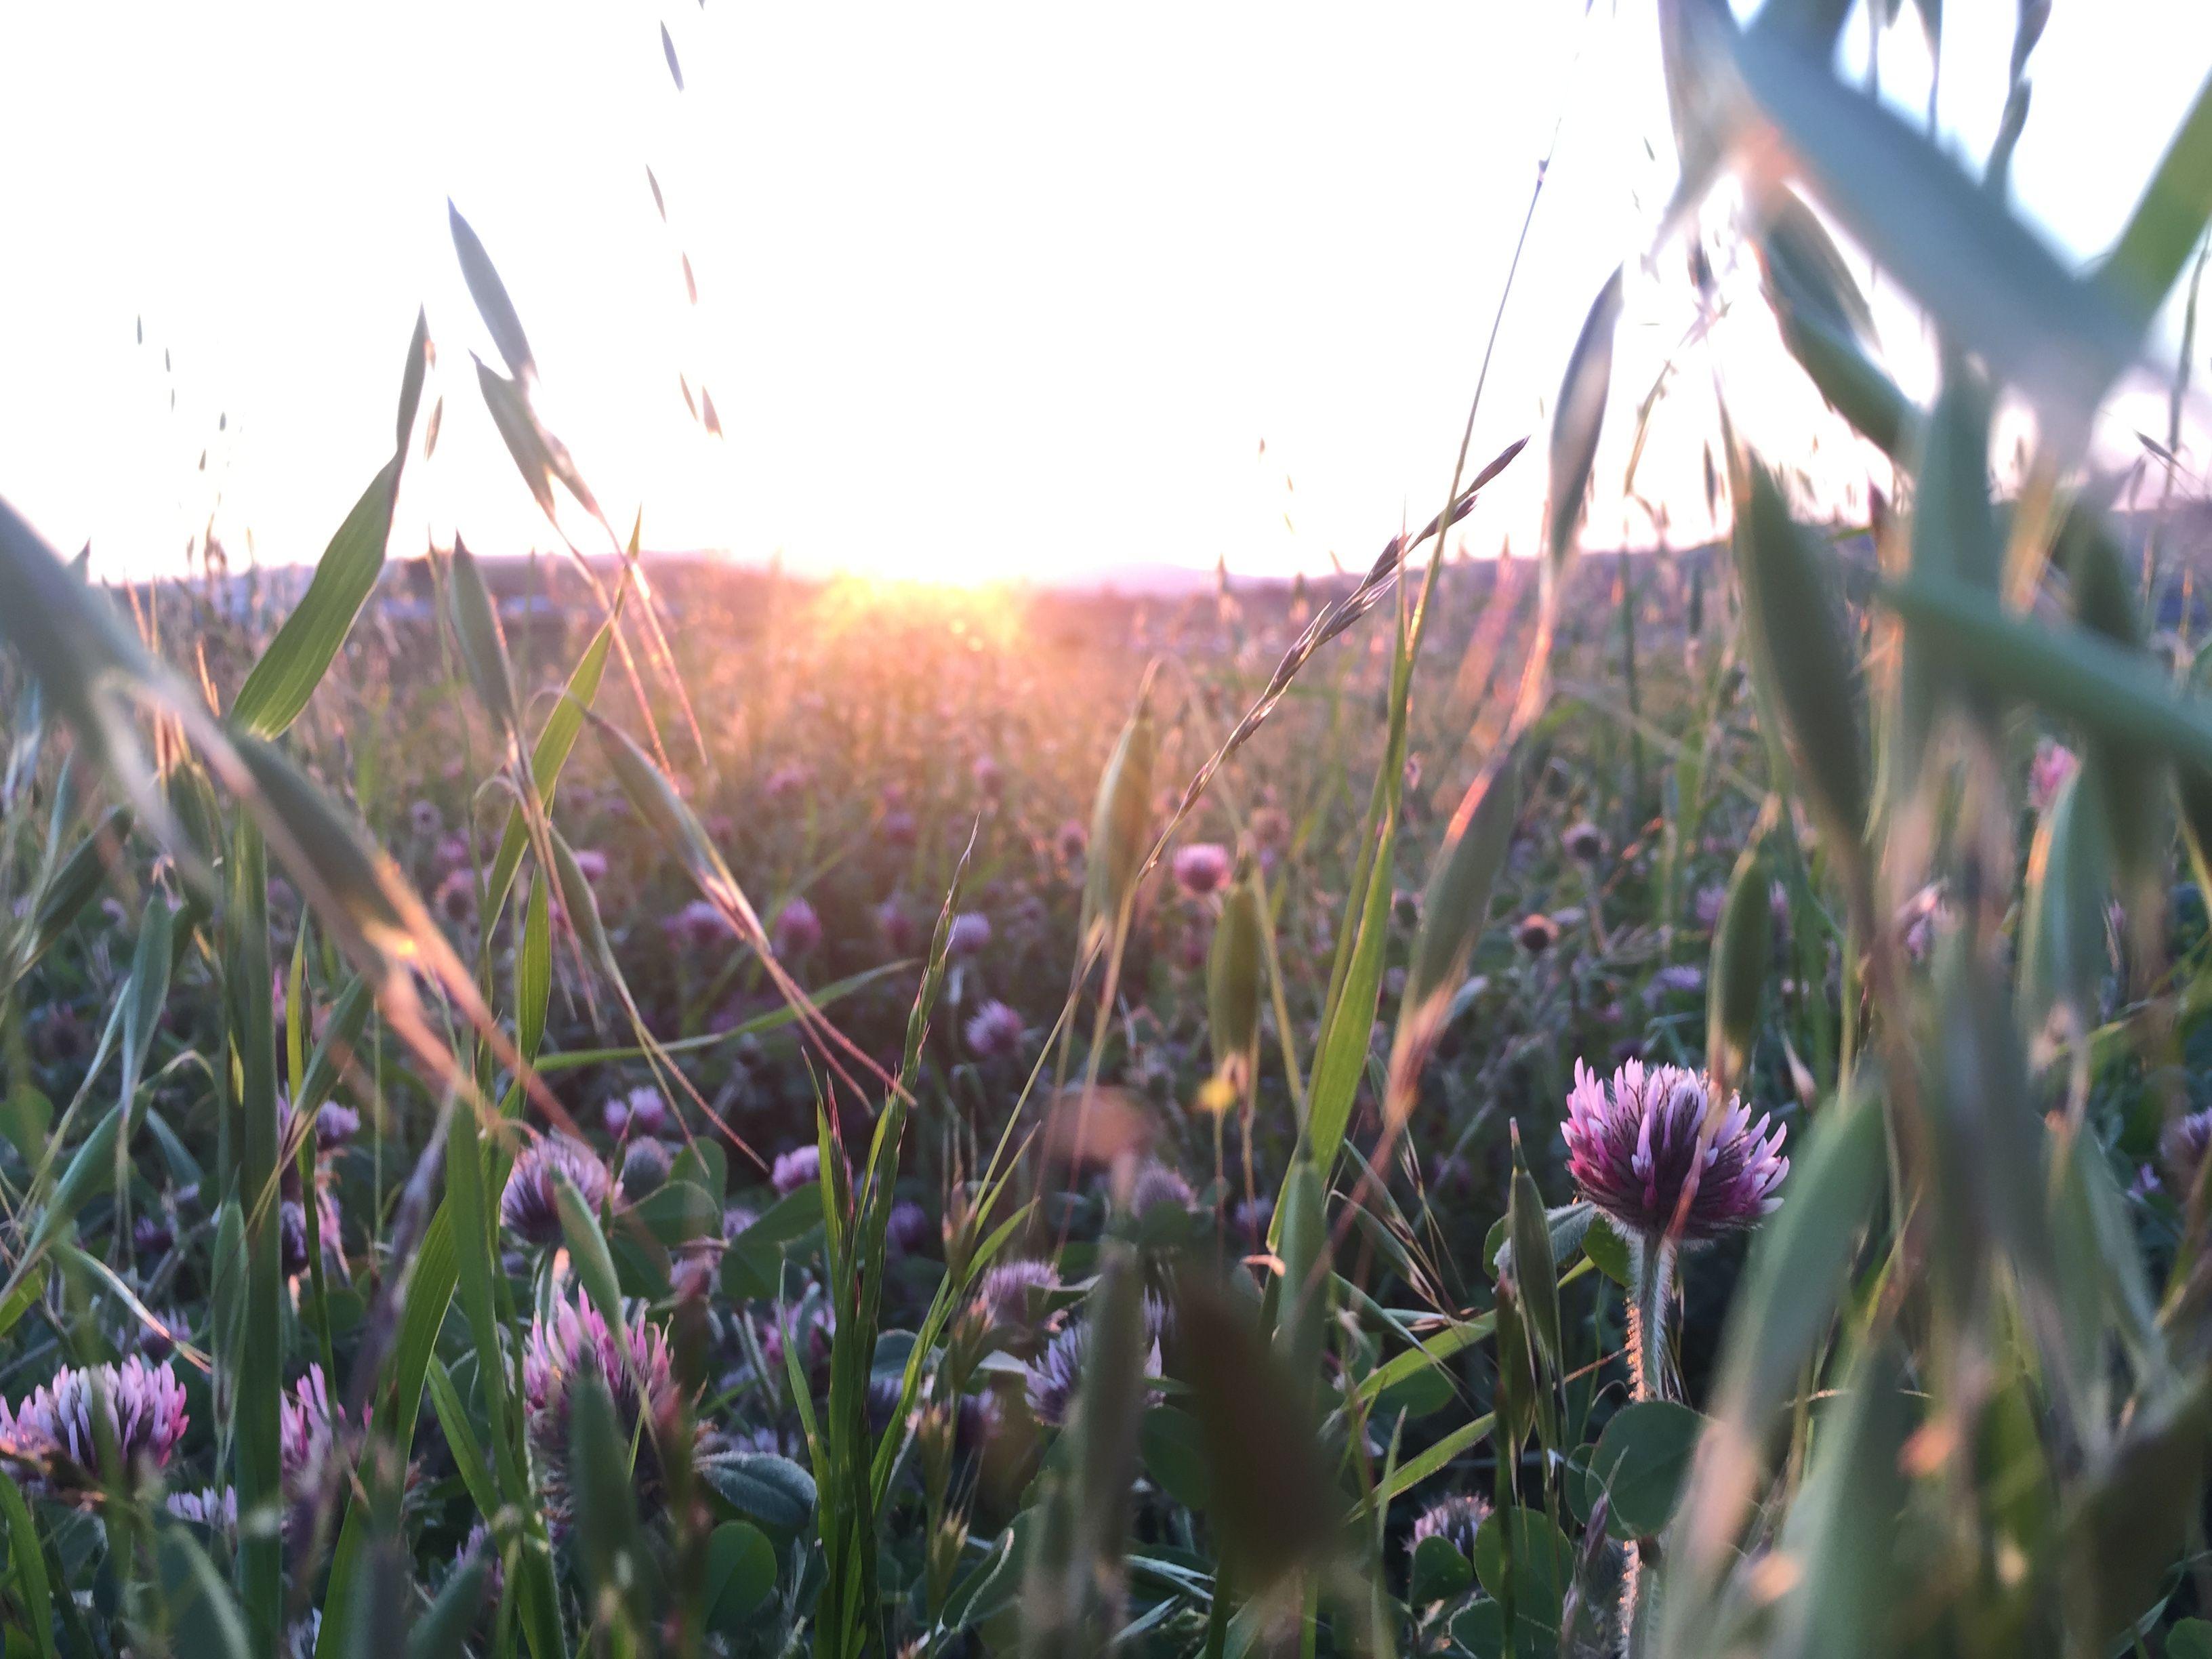 Grass Purple flowers Sunset Photography Sun rays Hill by chloehickss